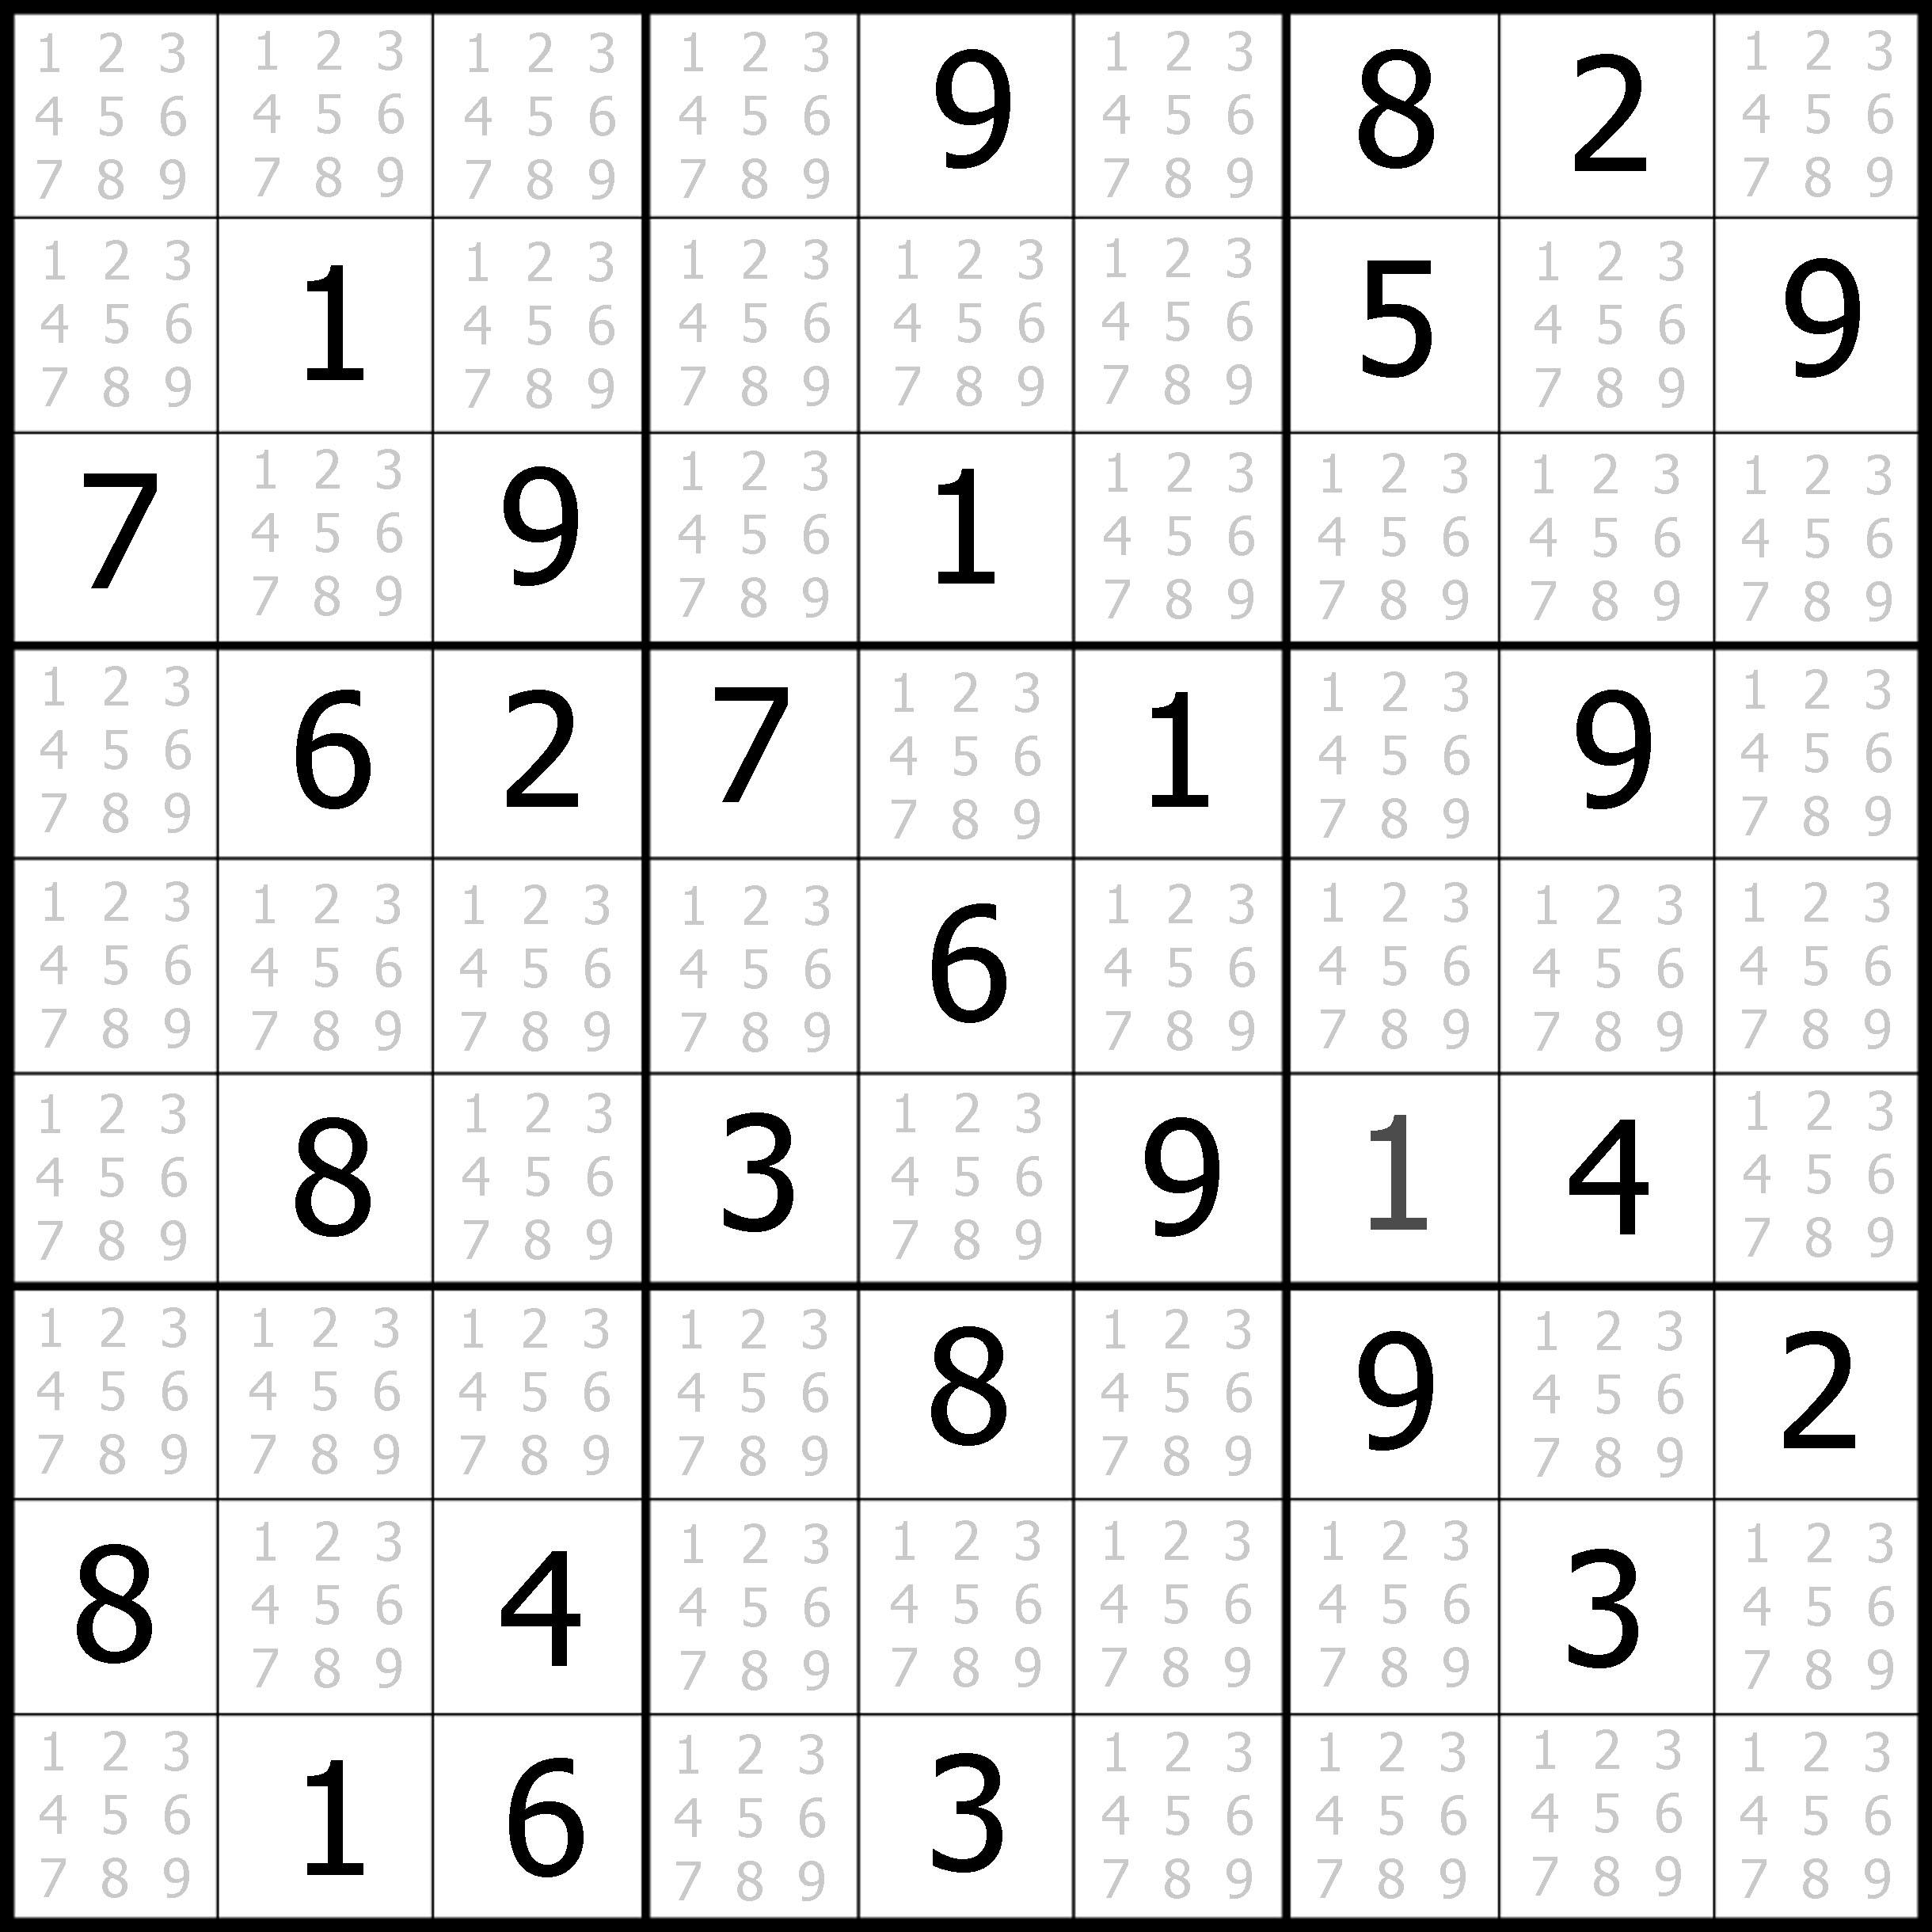 Sudoku Puzzler | Free, Printable, Updated Sudoku Puzzles With A - Printable Sudoku Puzzles Easy #1